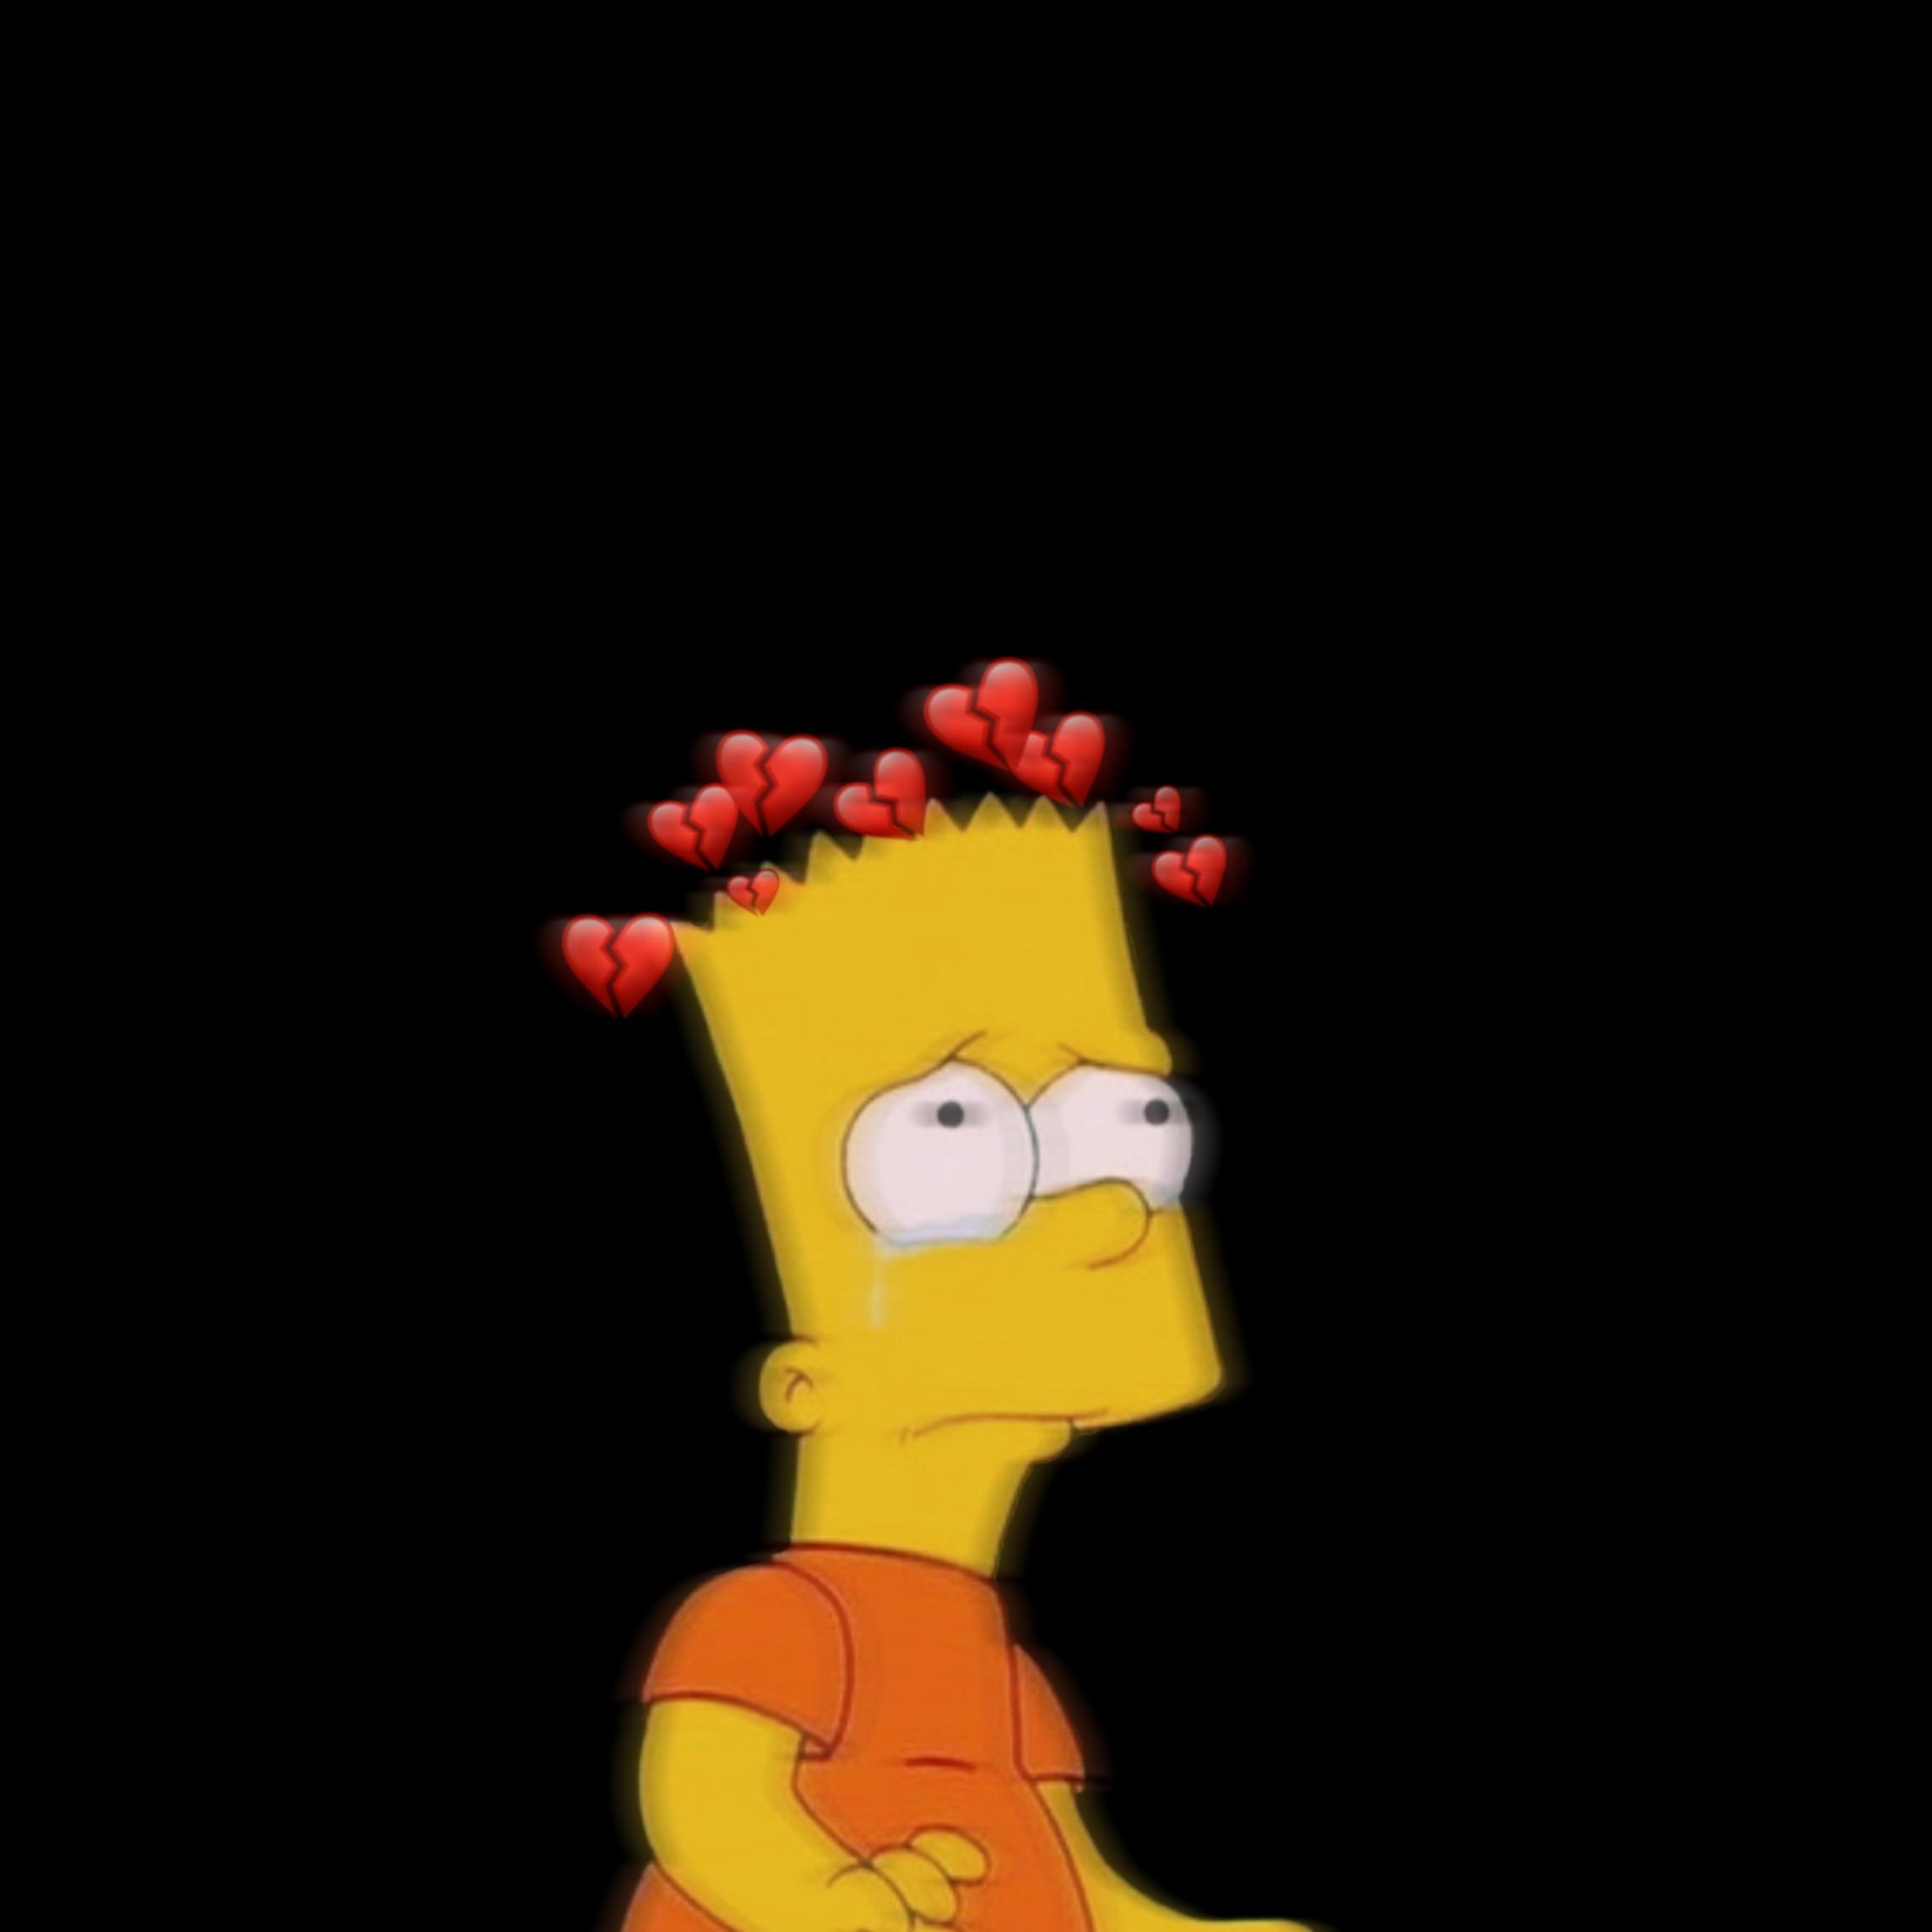 Bart Simpsons Bartsimpson Sad Emoji Brokenheart Brokenh